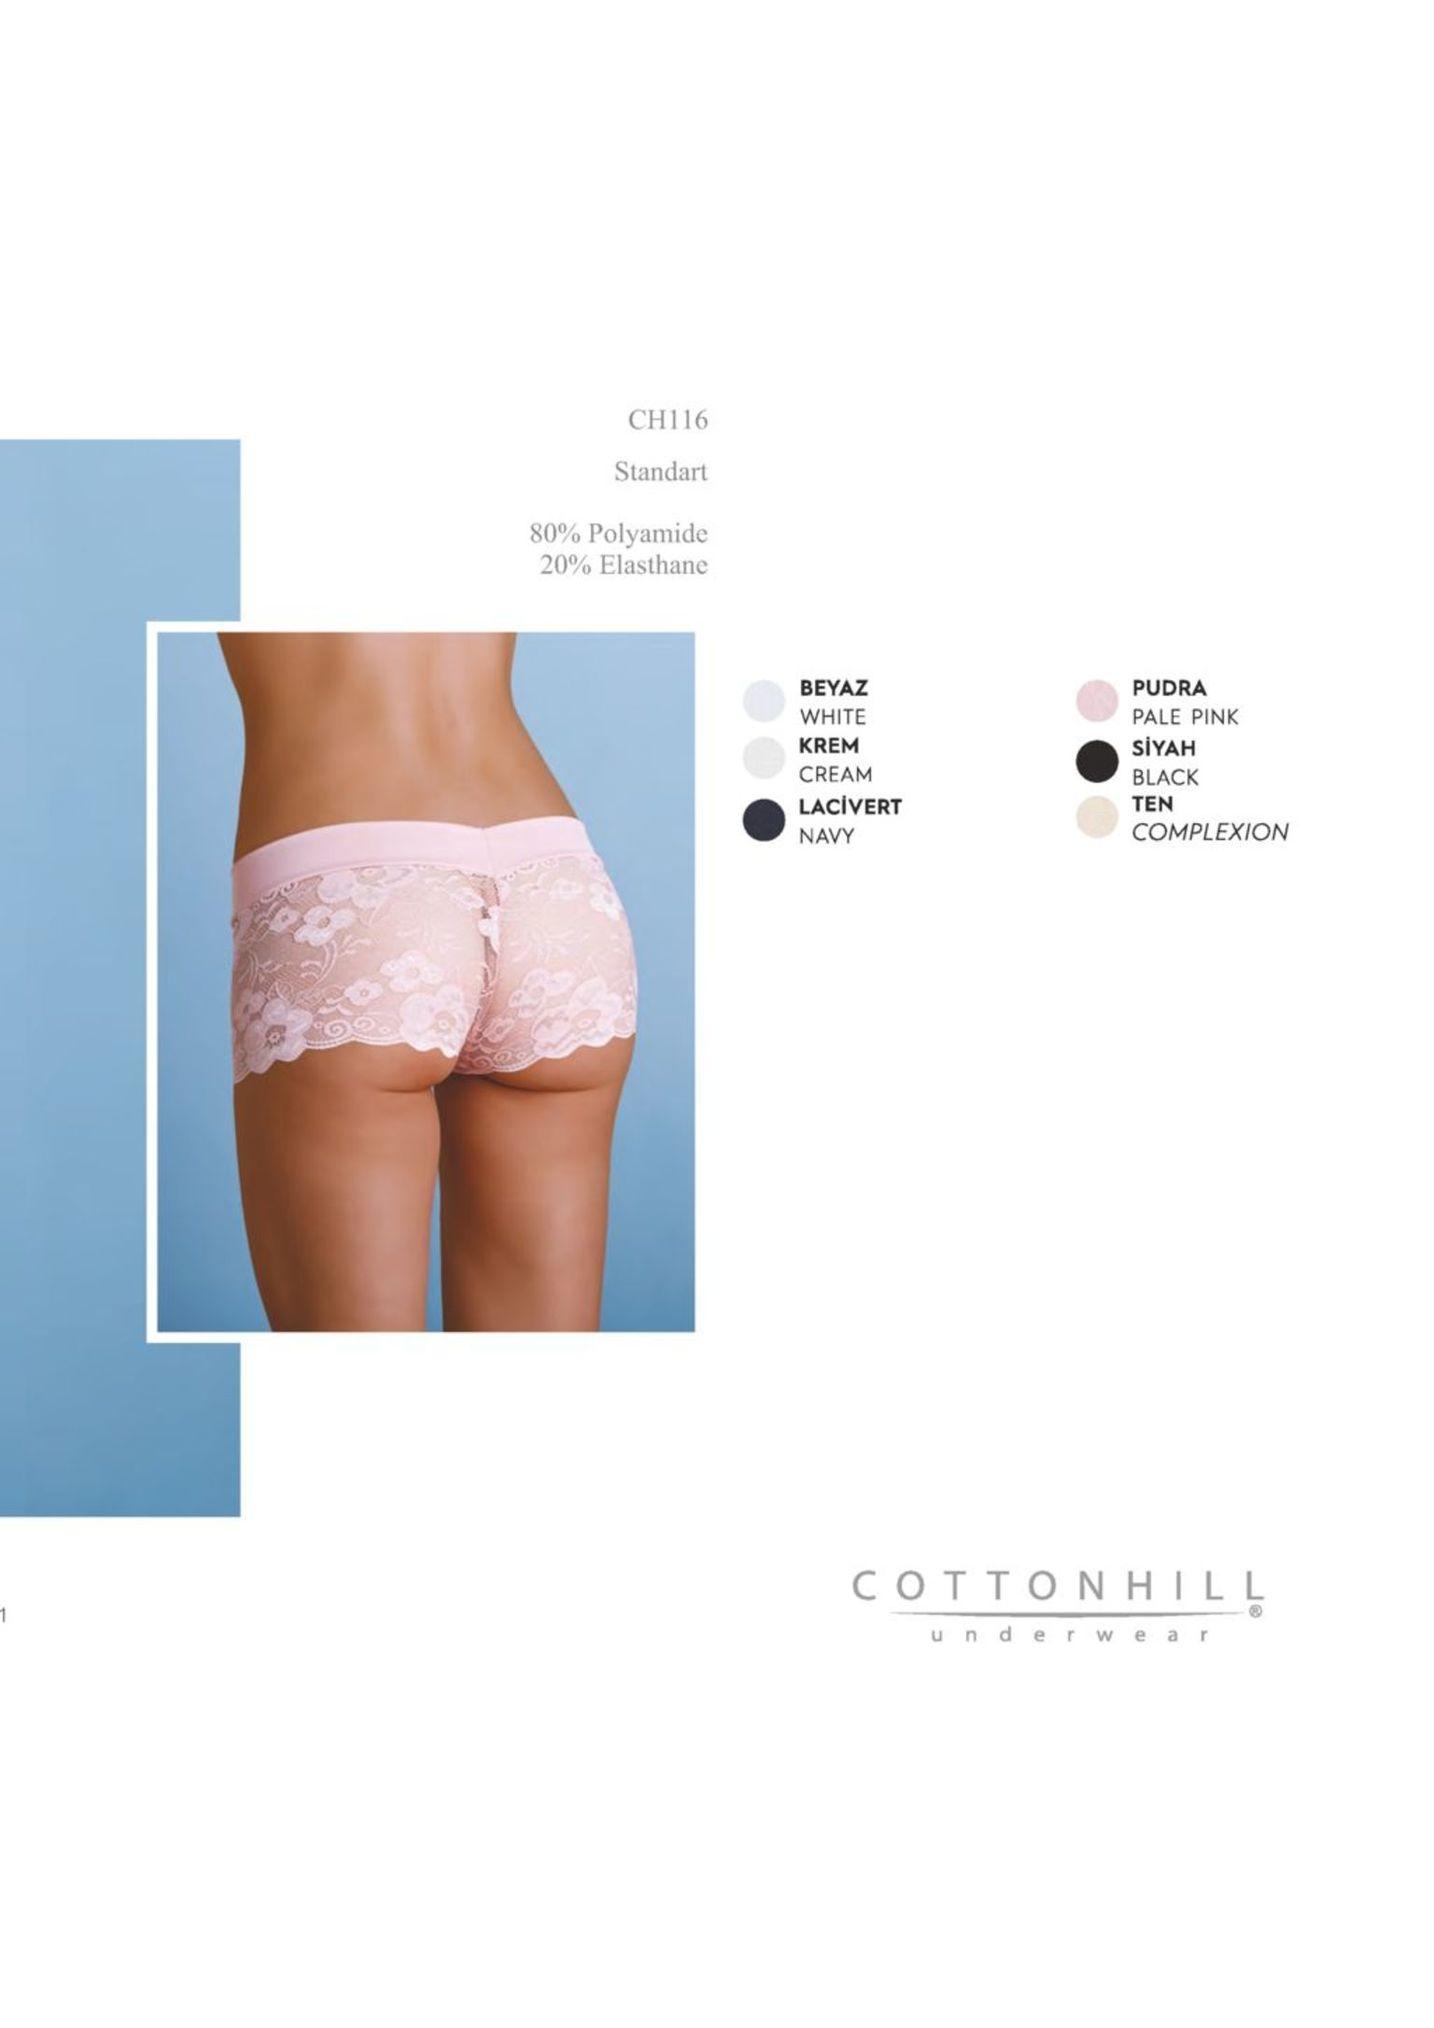 ch116 standart 80% polyamide 20% elasthane beyaz white krem cream lacivert navy pudra pale pink siyah black ten complexion cottonhill under w ea r